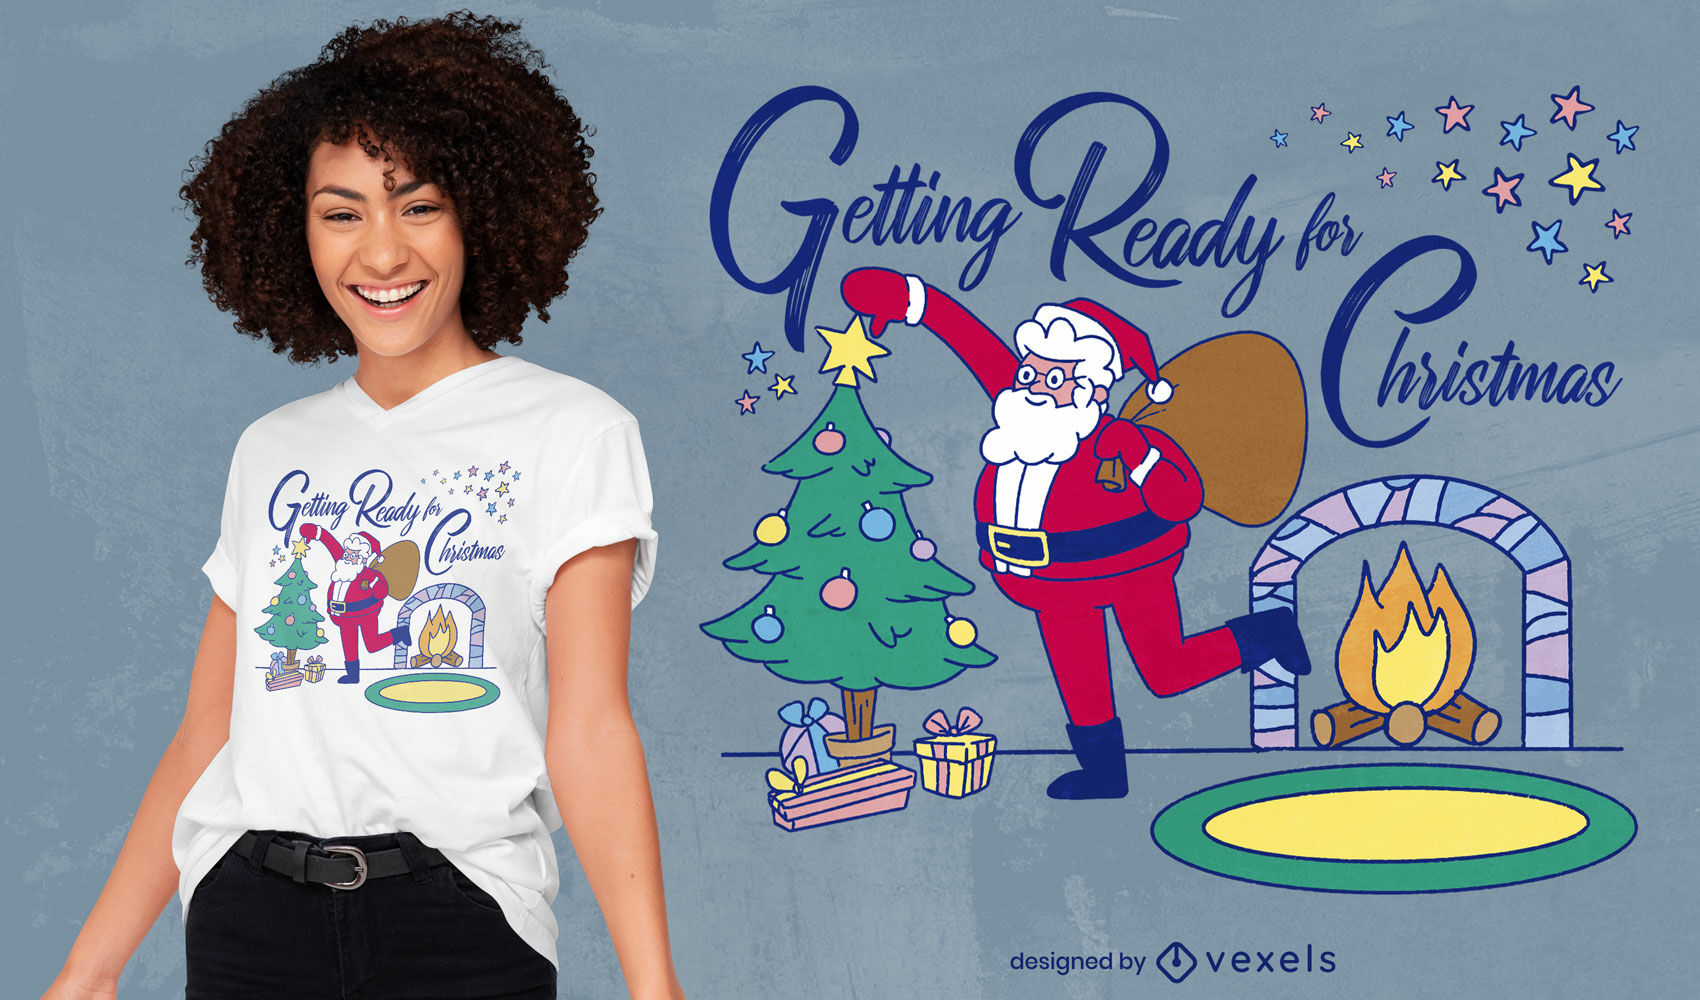 Dise?o de camiseta navide?a de santa claus y chimenea.